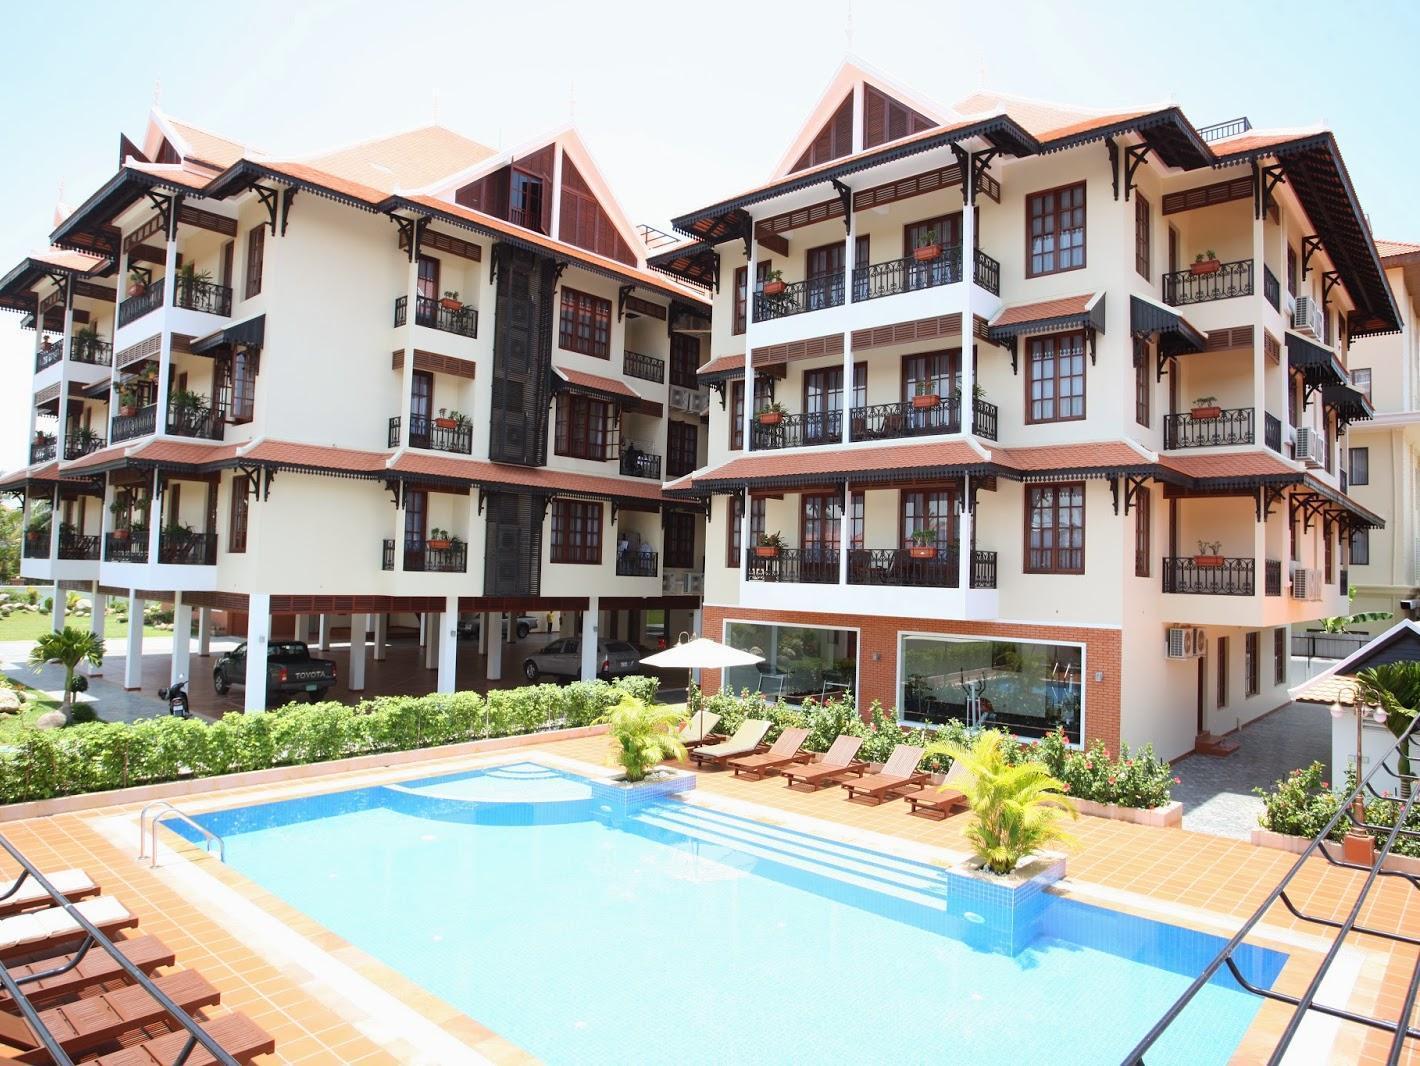 Steung Siemreap Residences & Apartment - Siem Reap